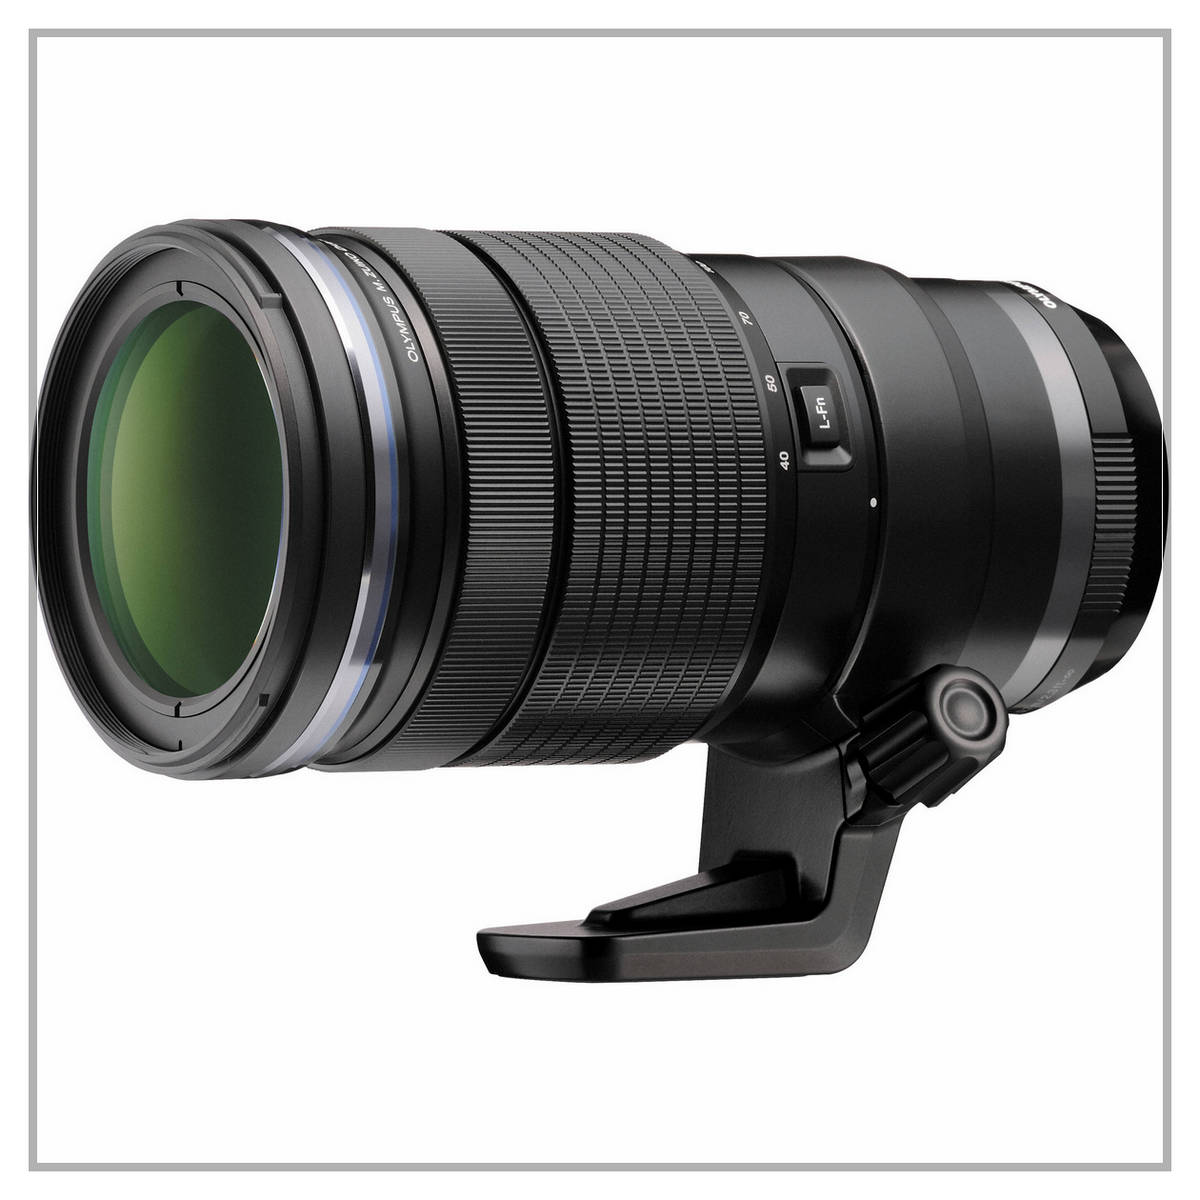 Olympus 40-150 f2.8 Pro